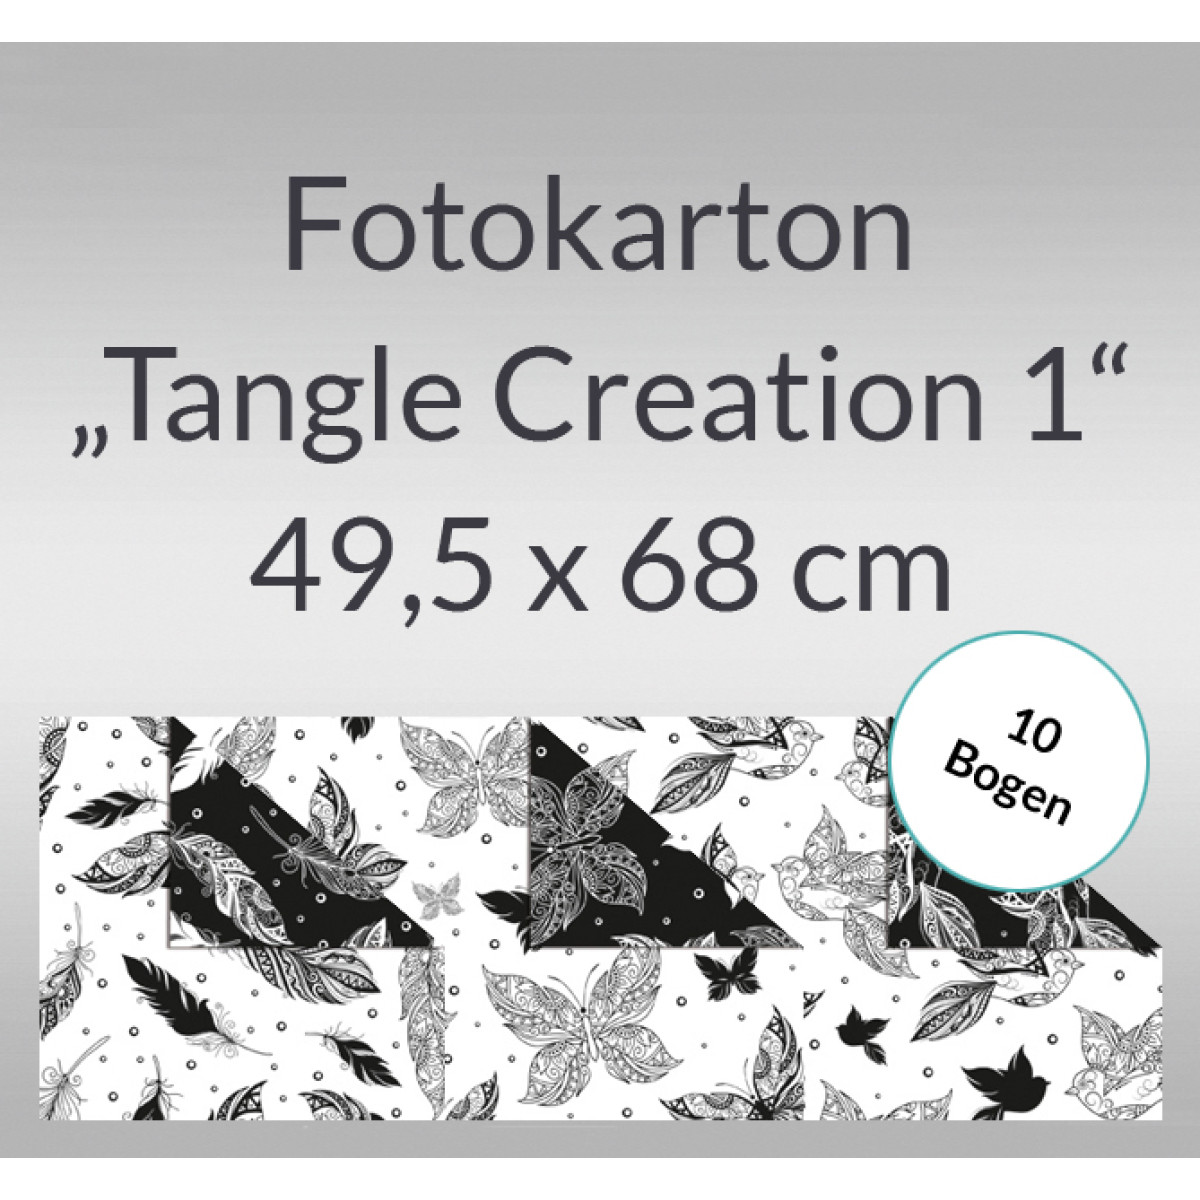 "Fotokarton ""Tangle Creation 1"" 49,5 x 68 cm - 10 Bogen"